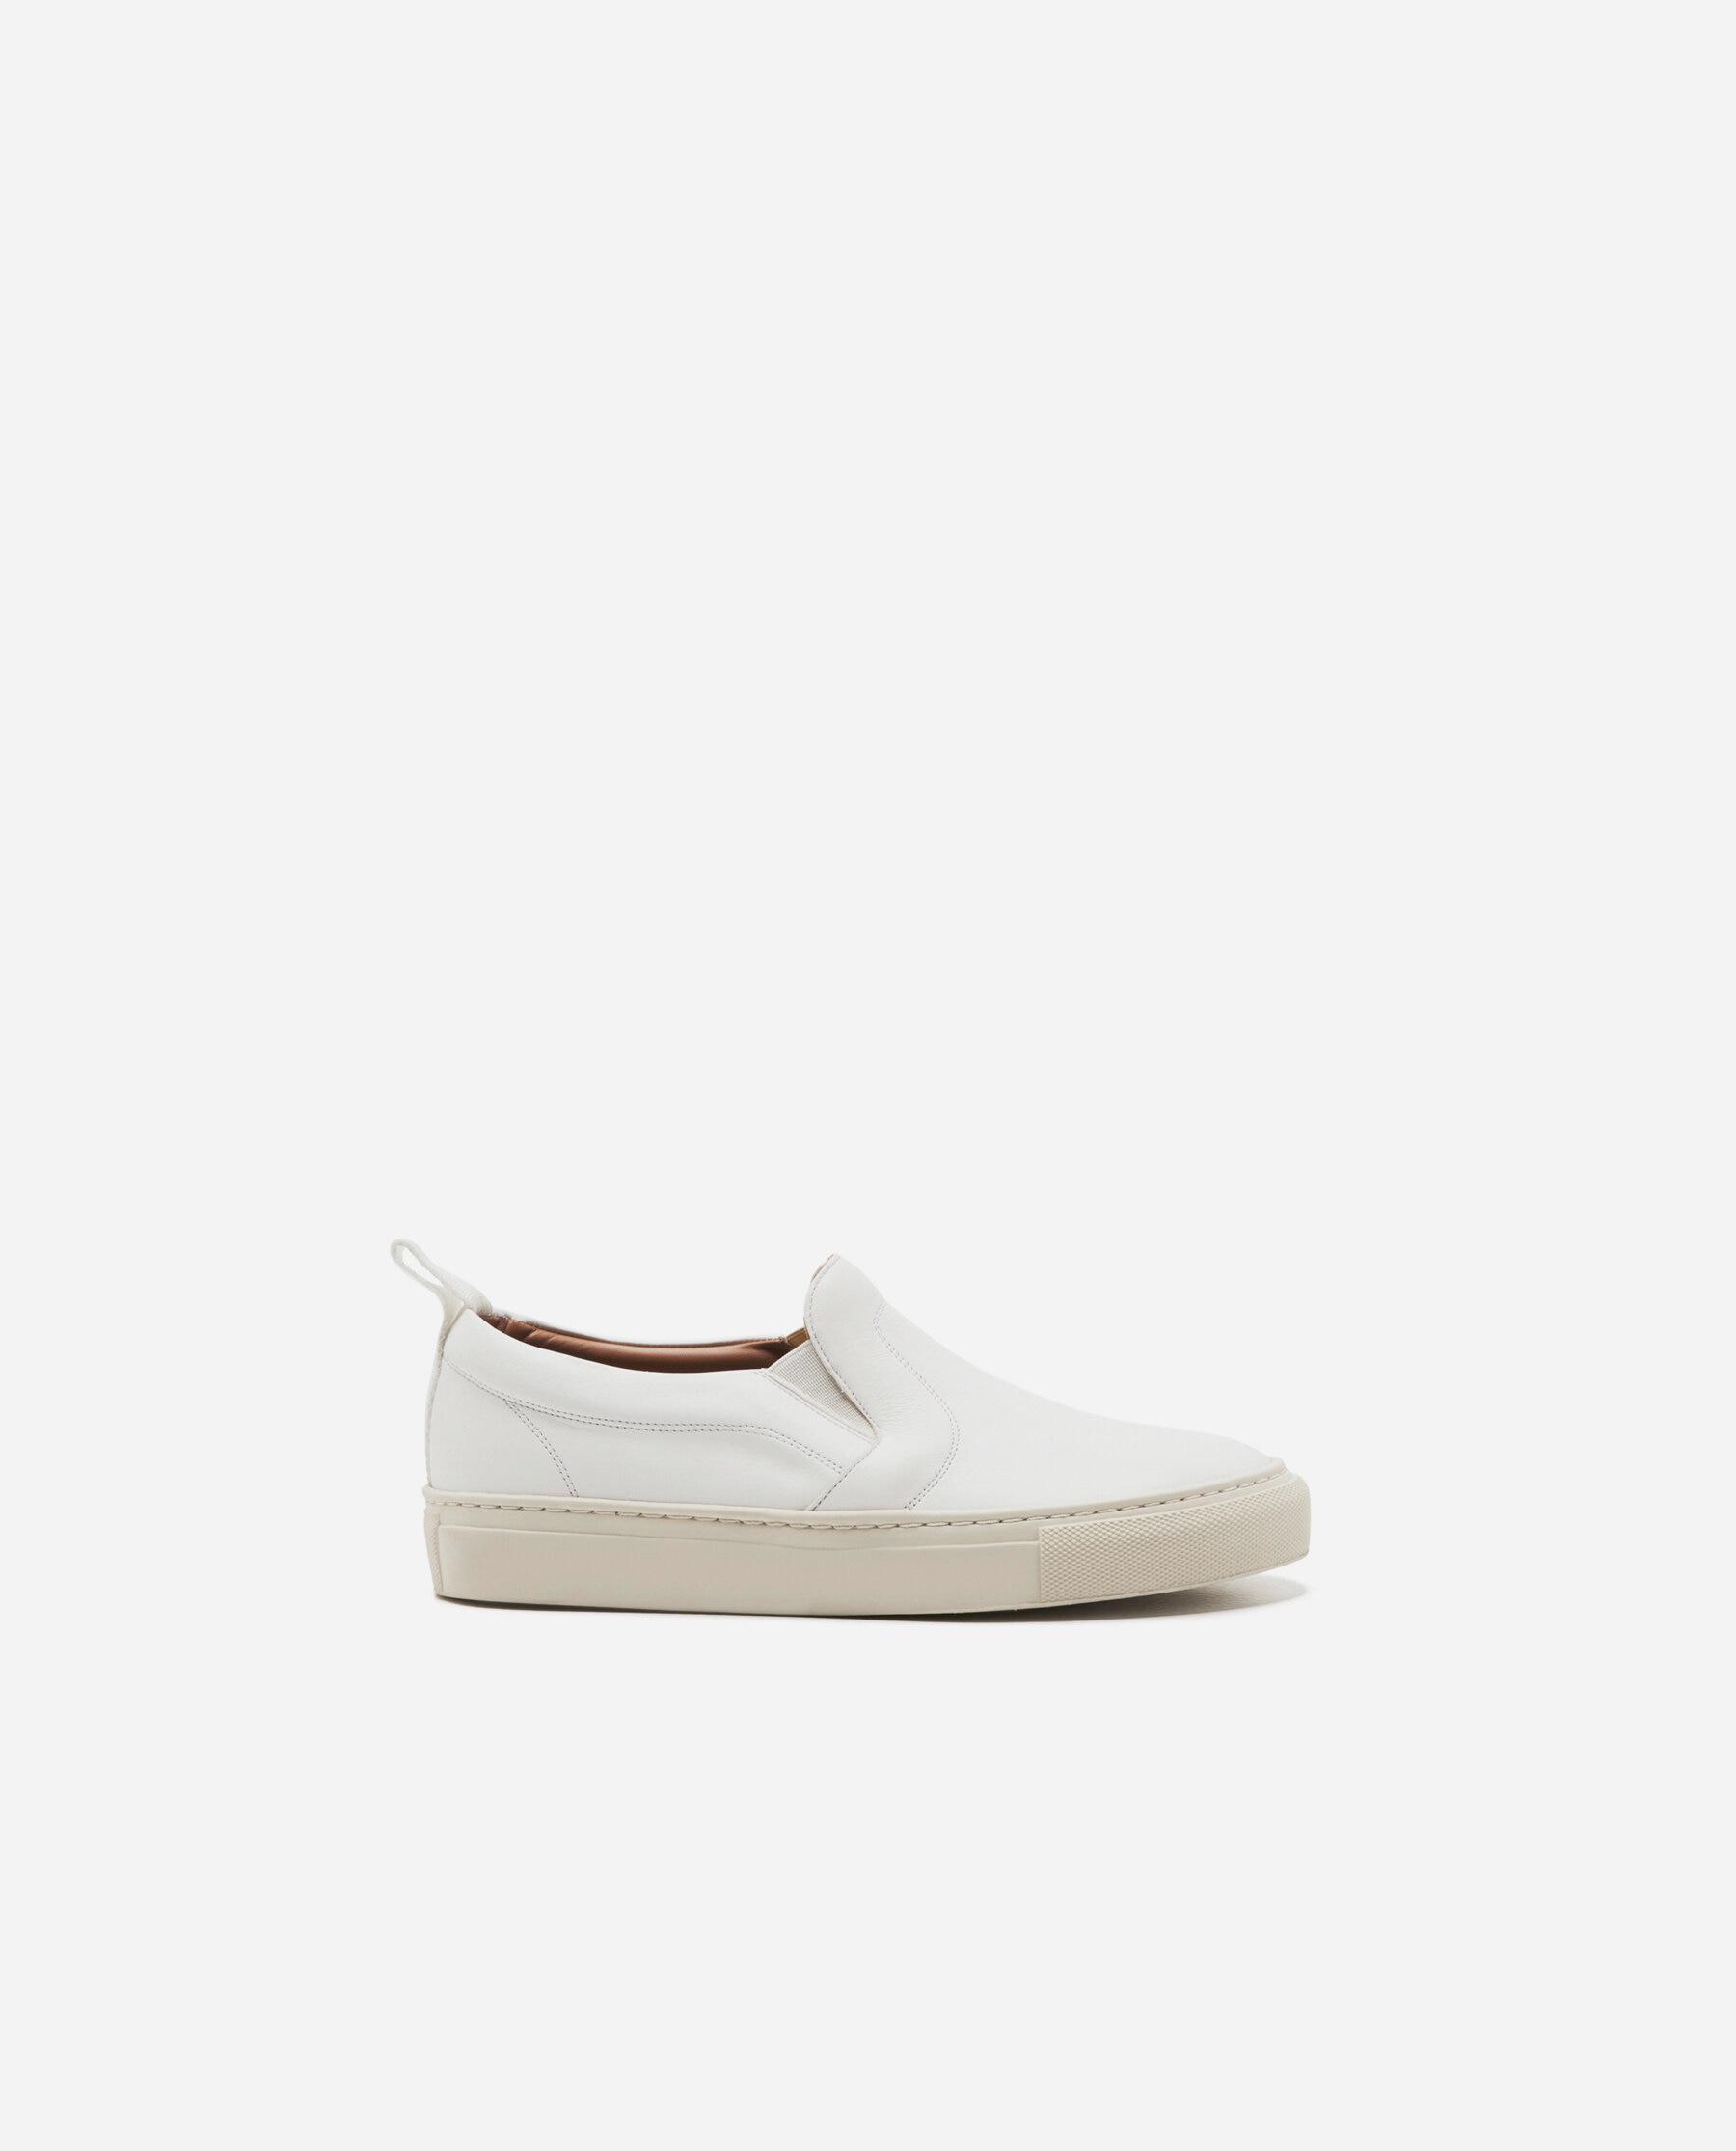 Haga Leather White